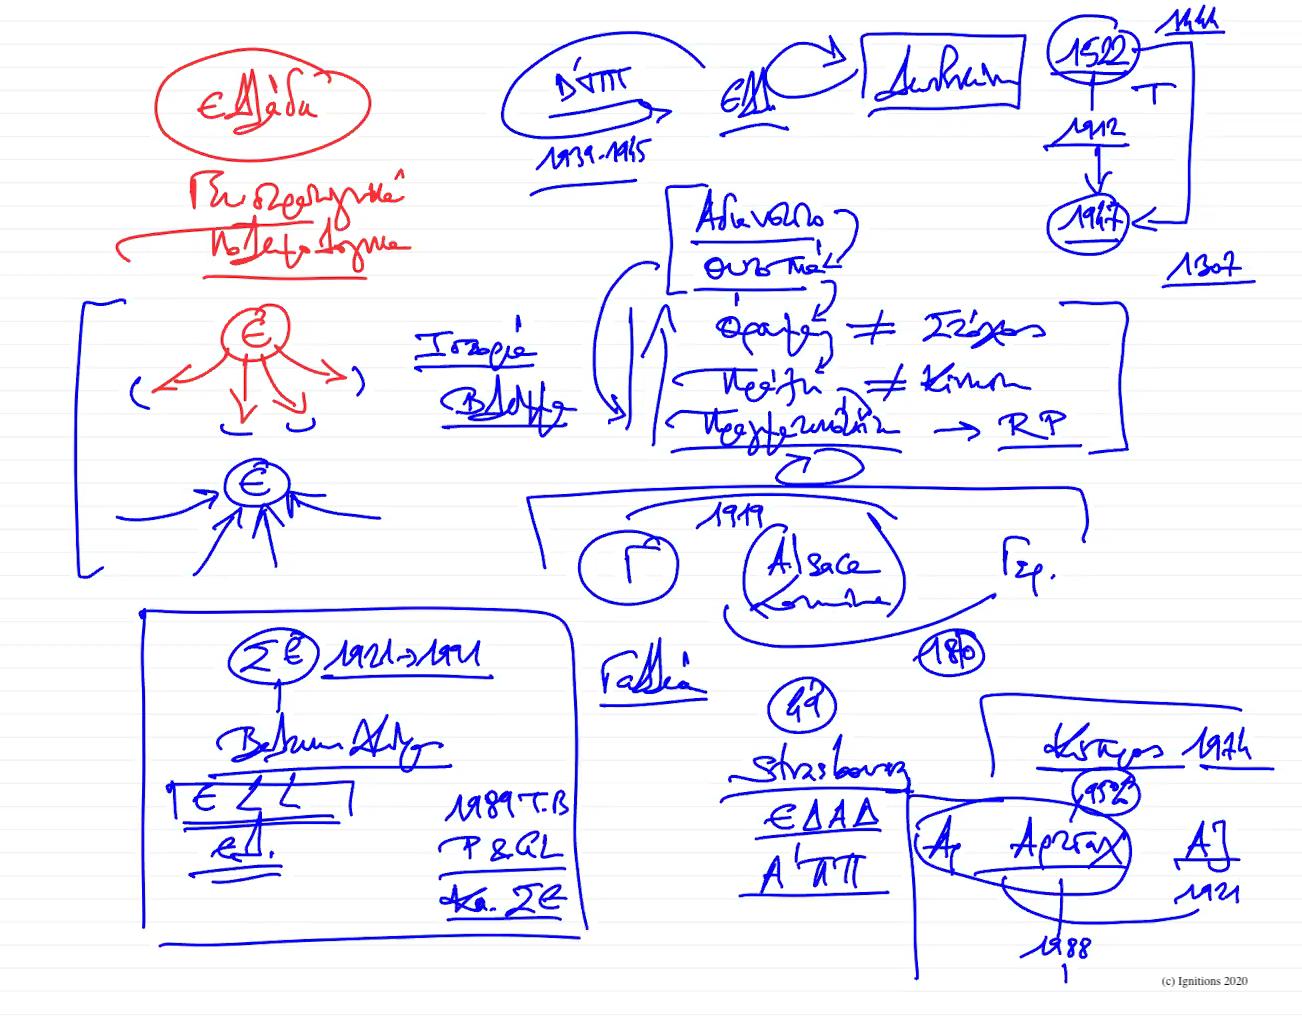 56027 - XVII - e-Διάλεξη: Ελληνική Γεωστρατηγική I. (Dessin)